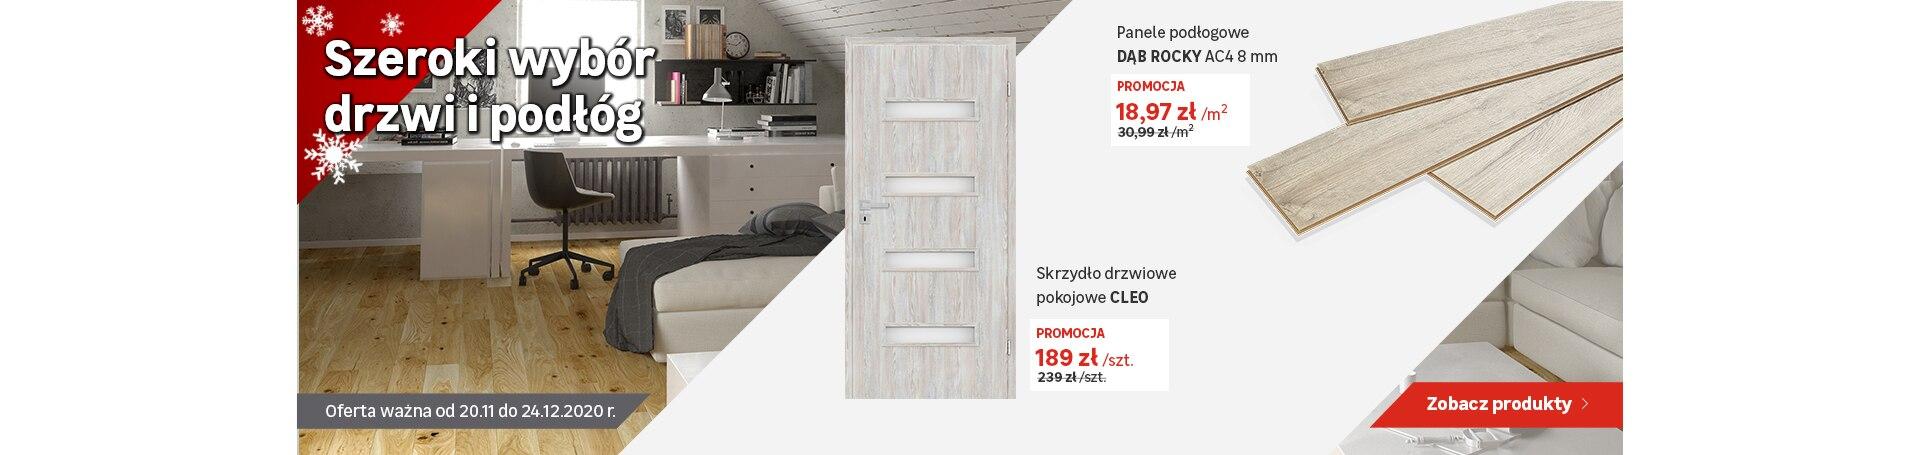 ps-drzwi-i-podlogi-20.11-24.12.2020-1920x455